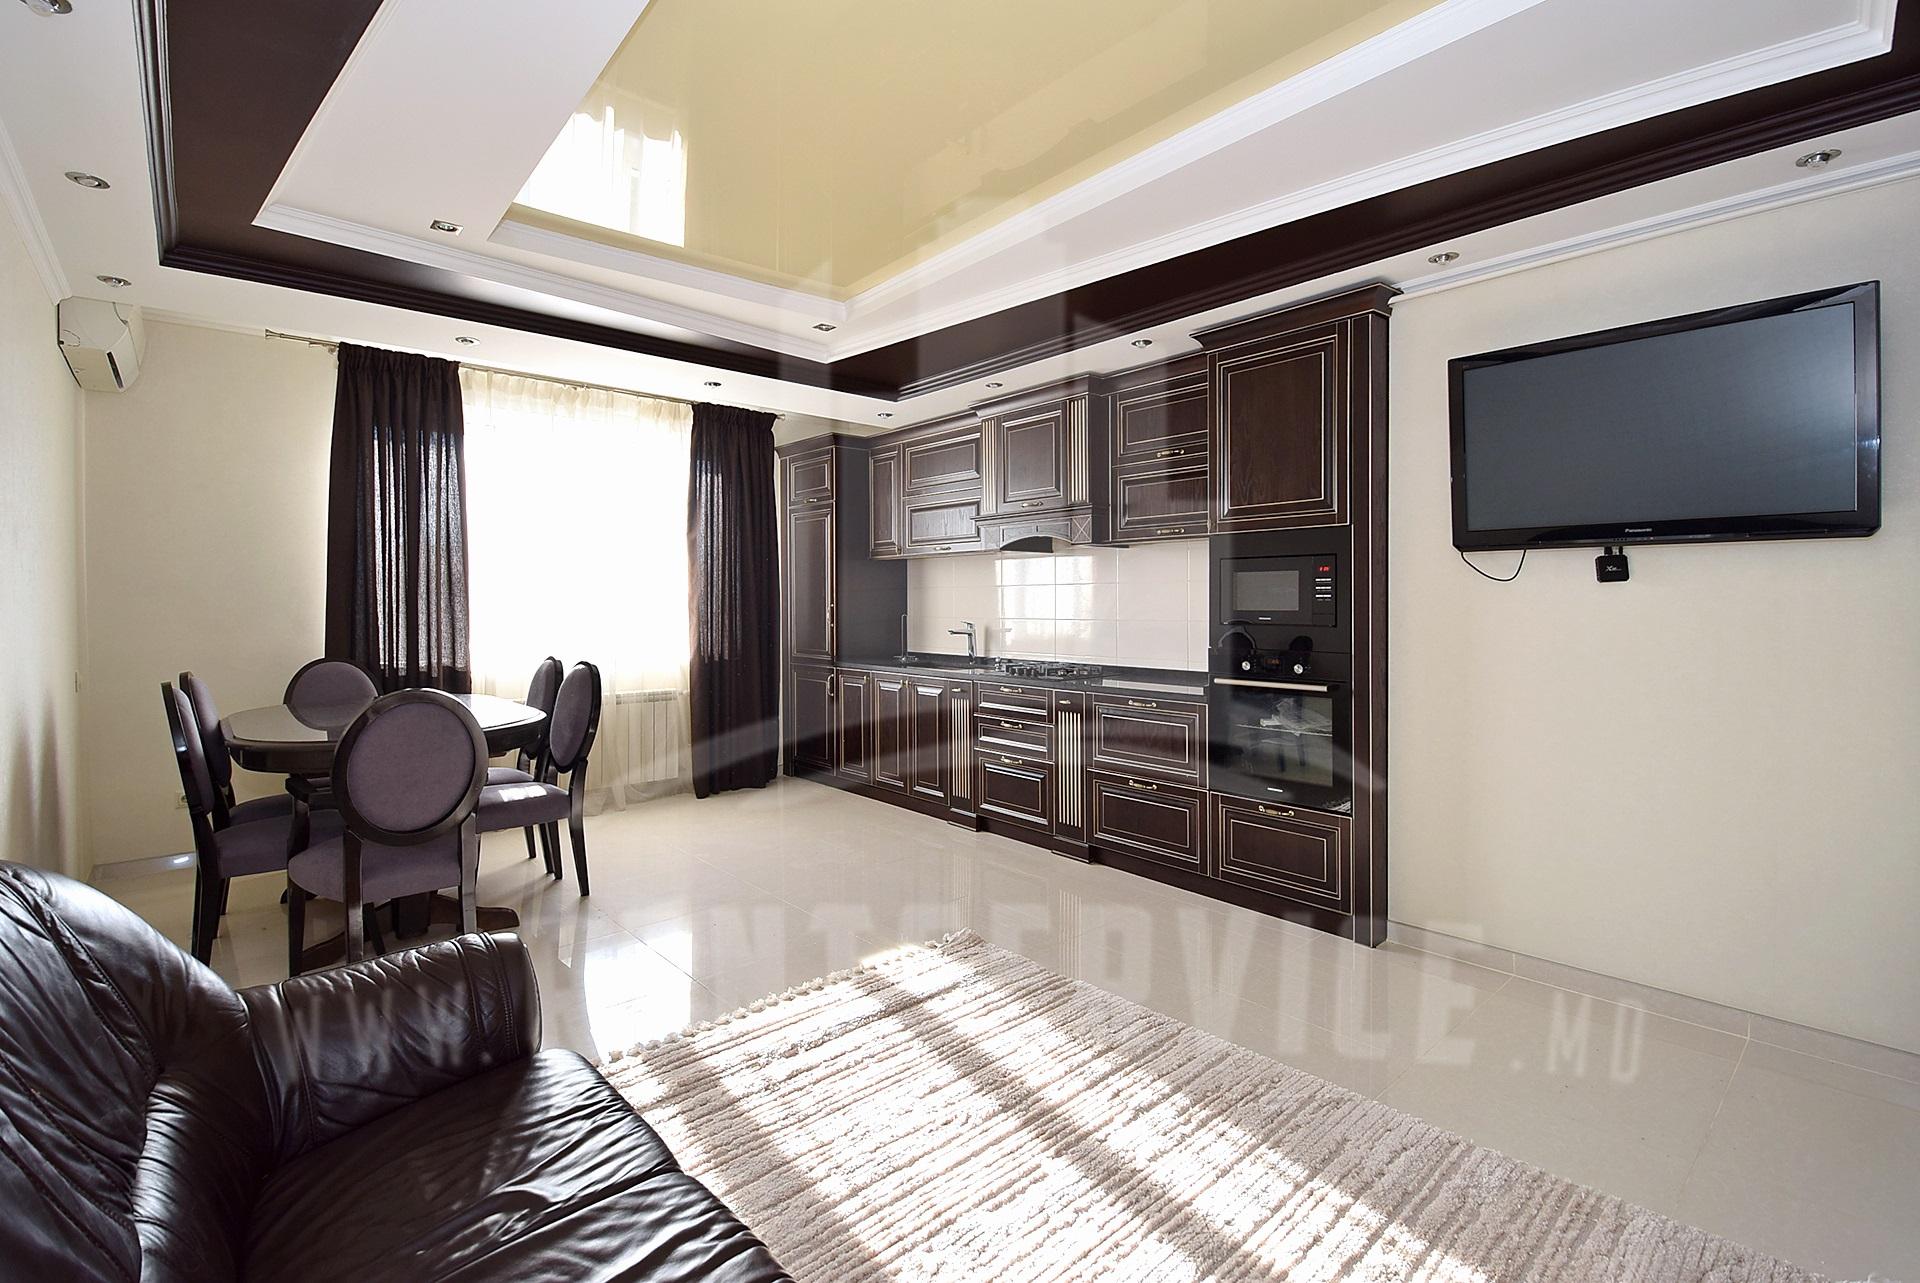 290_apartment_Front.JPG